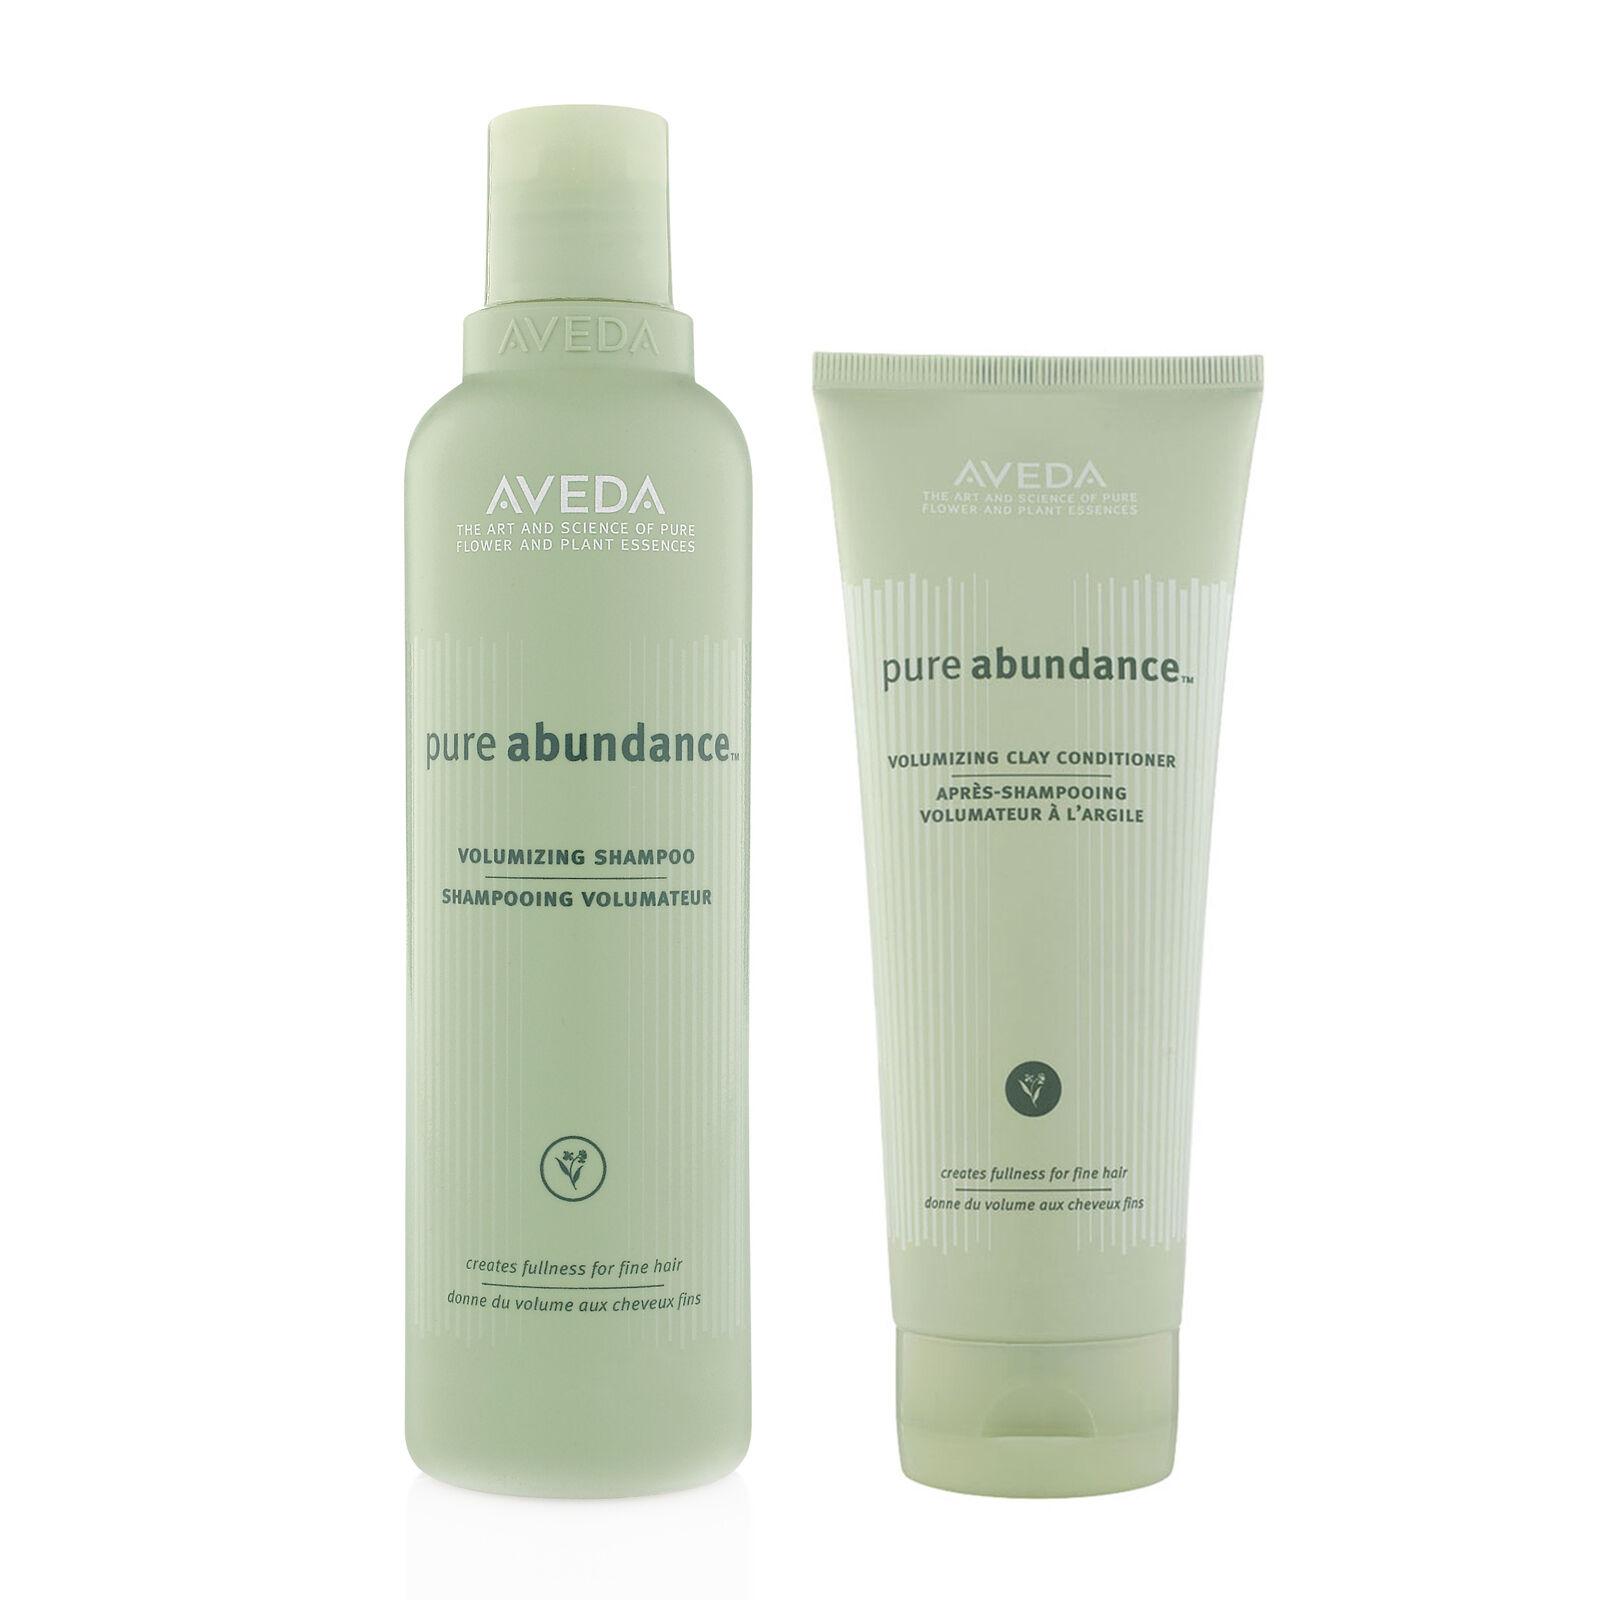 Aveda pure abundance volumizing shampoo and conditioner 8.5